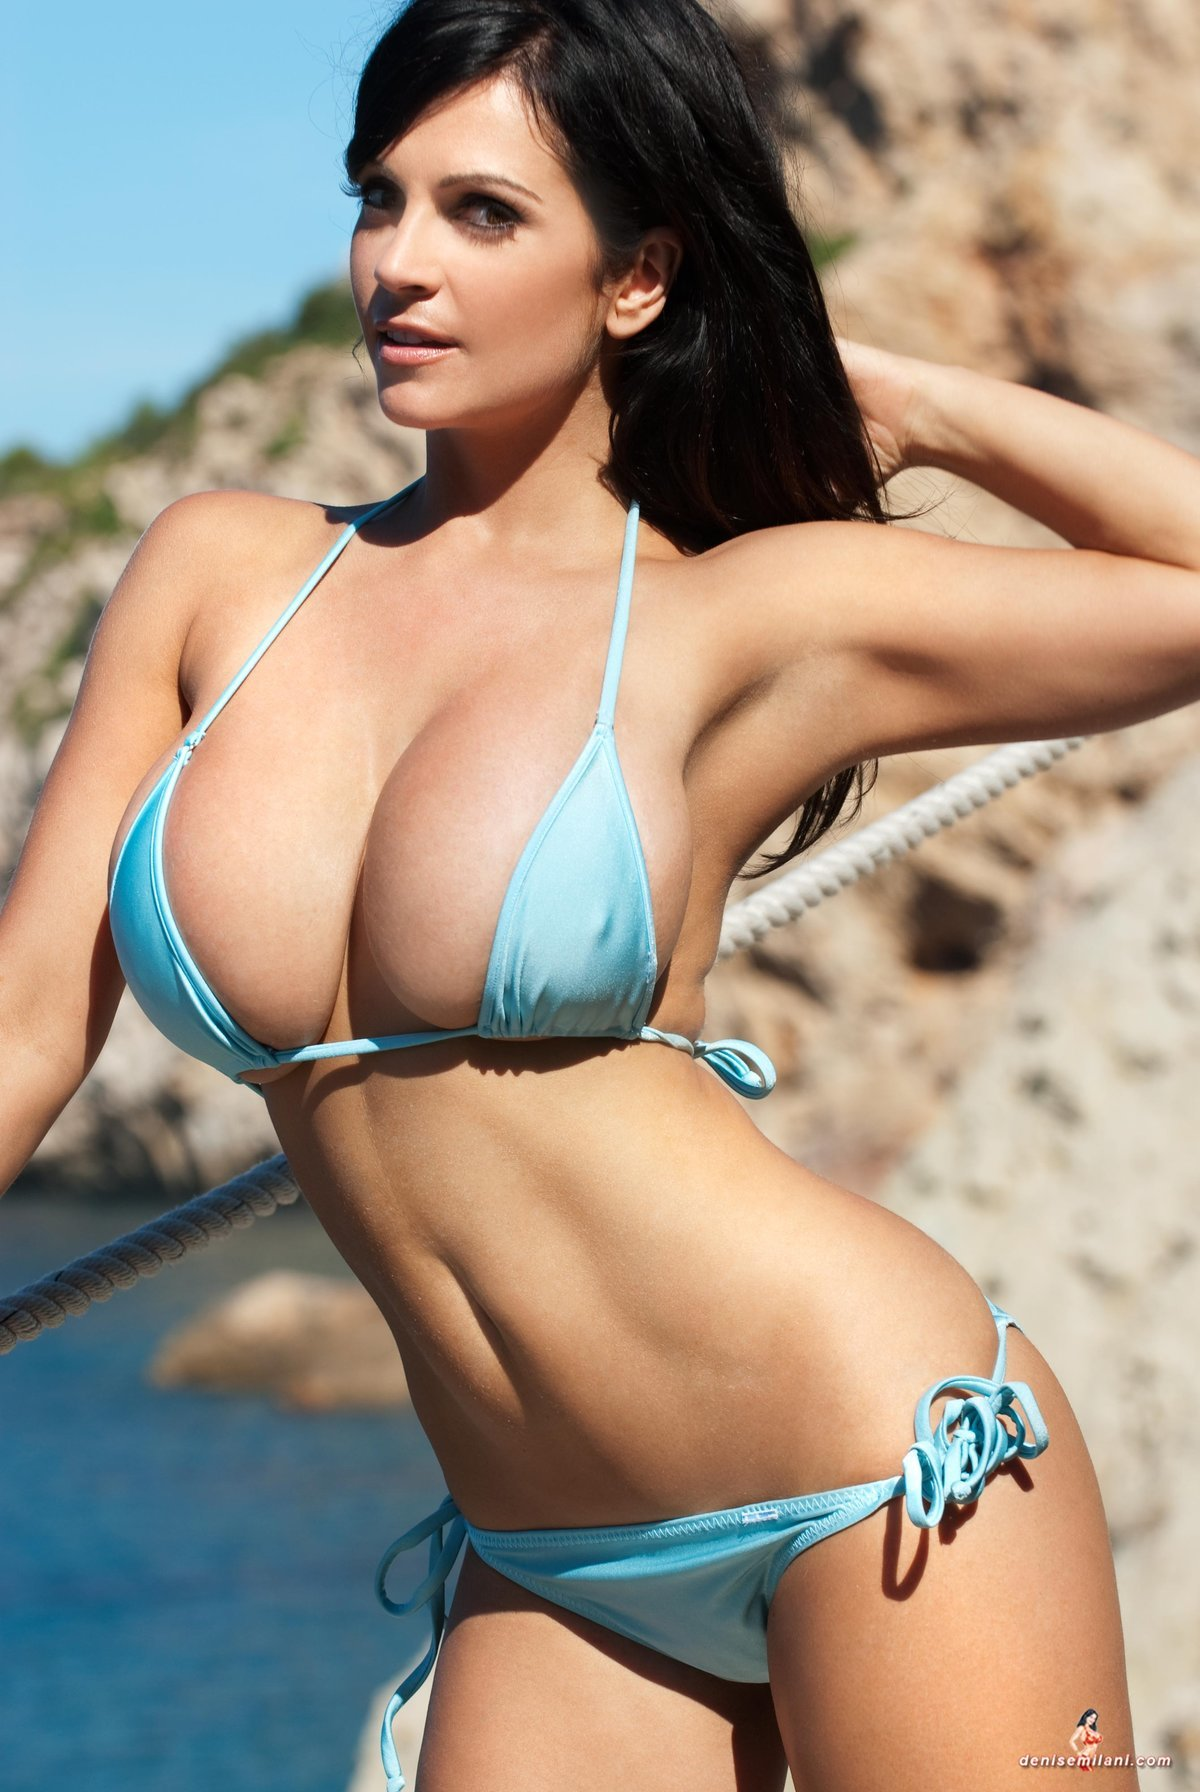 Busty women in bikini